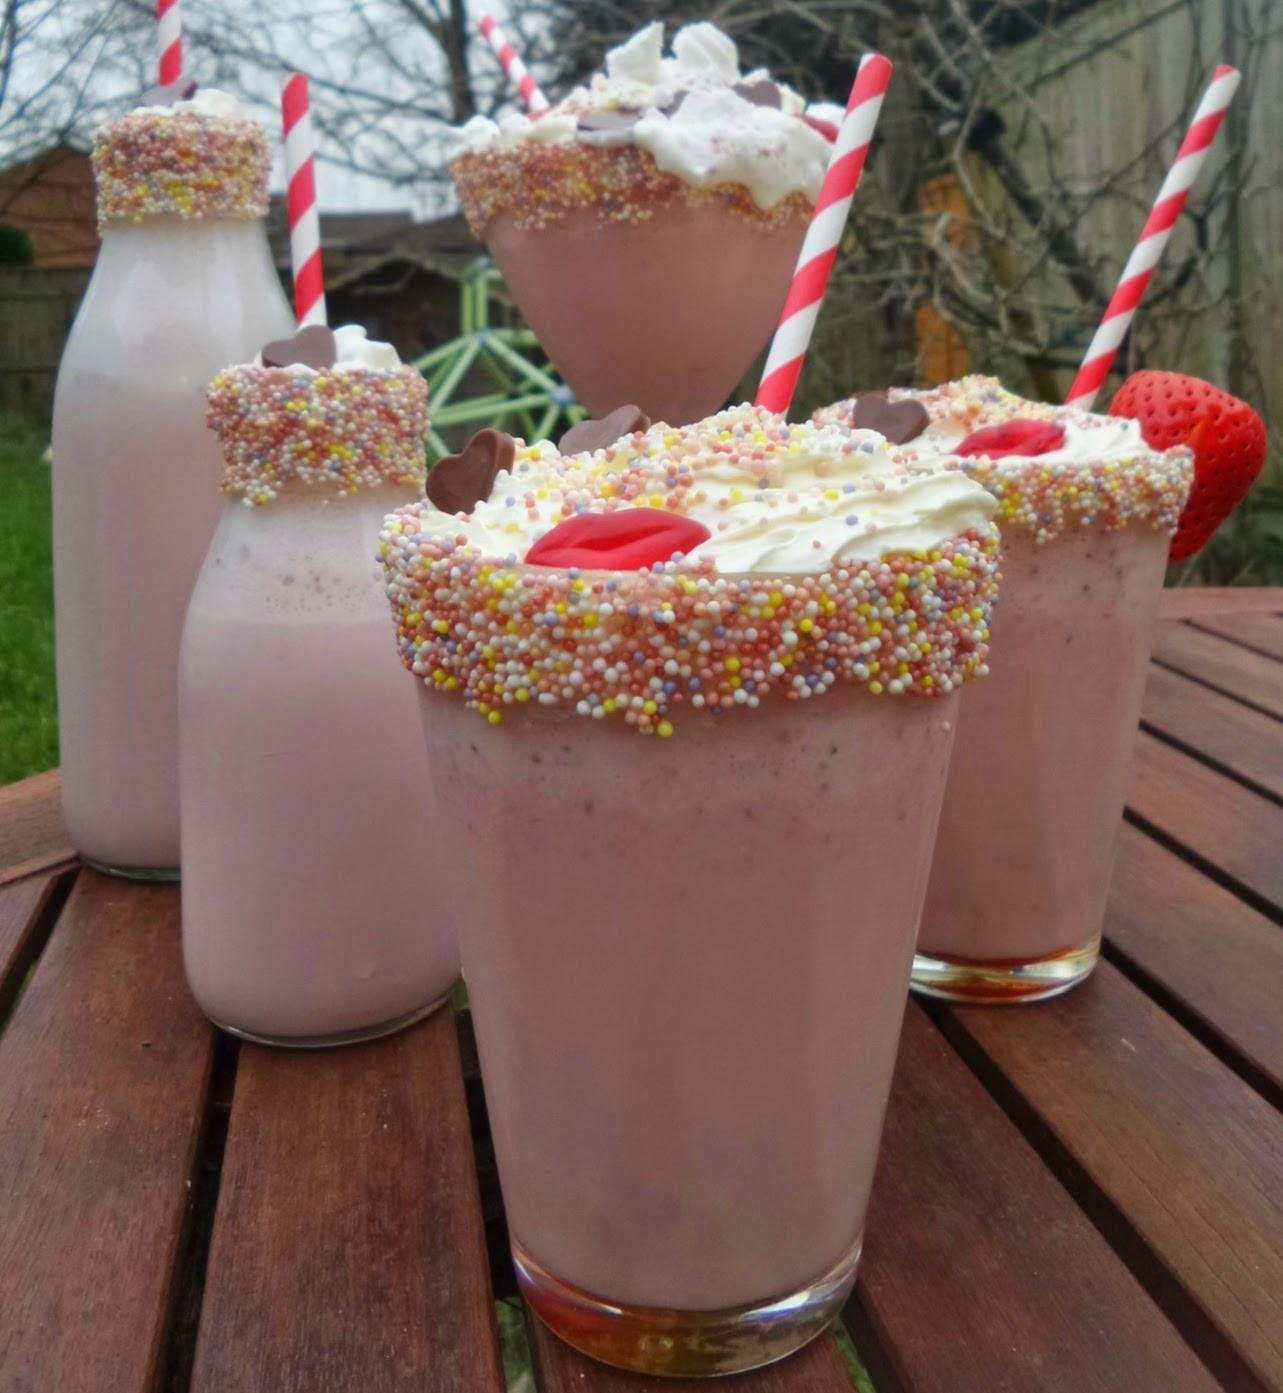 Valentine's Strawberry Milkshakes with Sugar Strand Rimmed Glasses